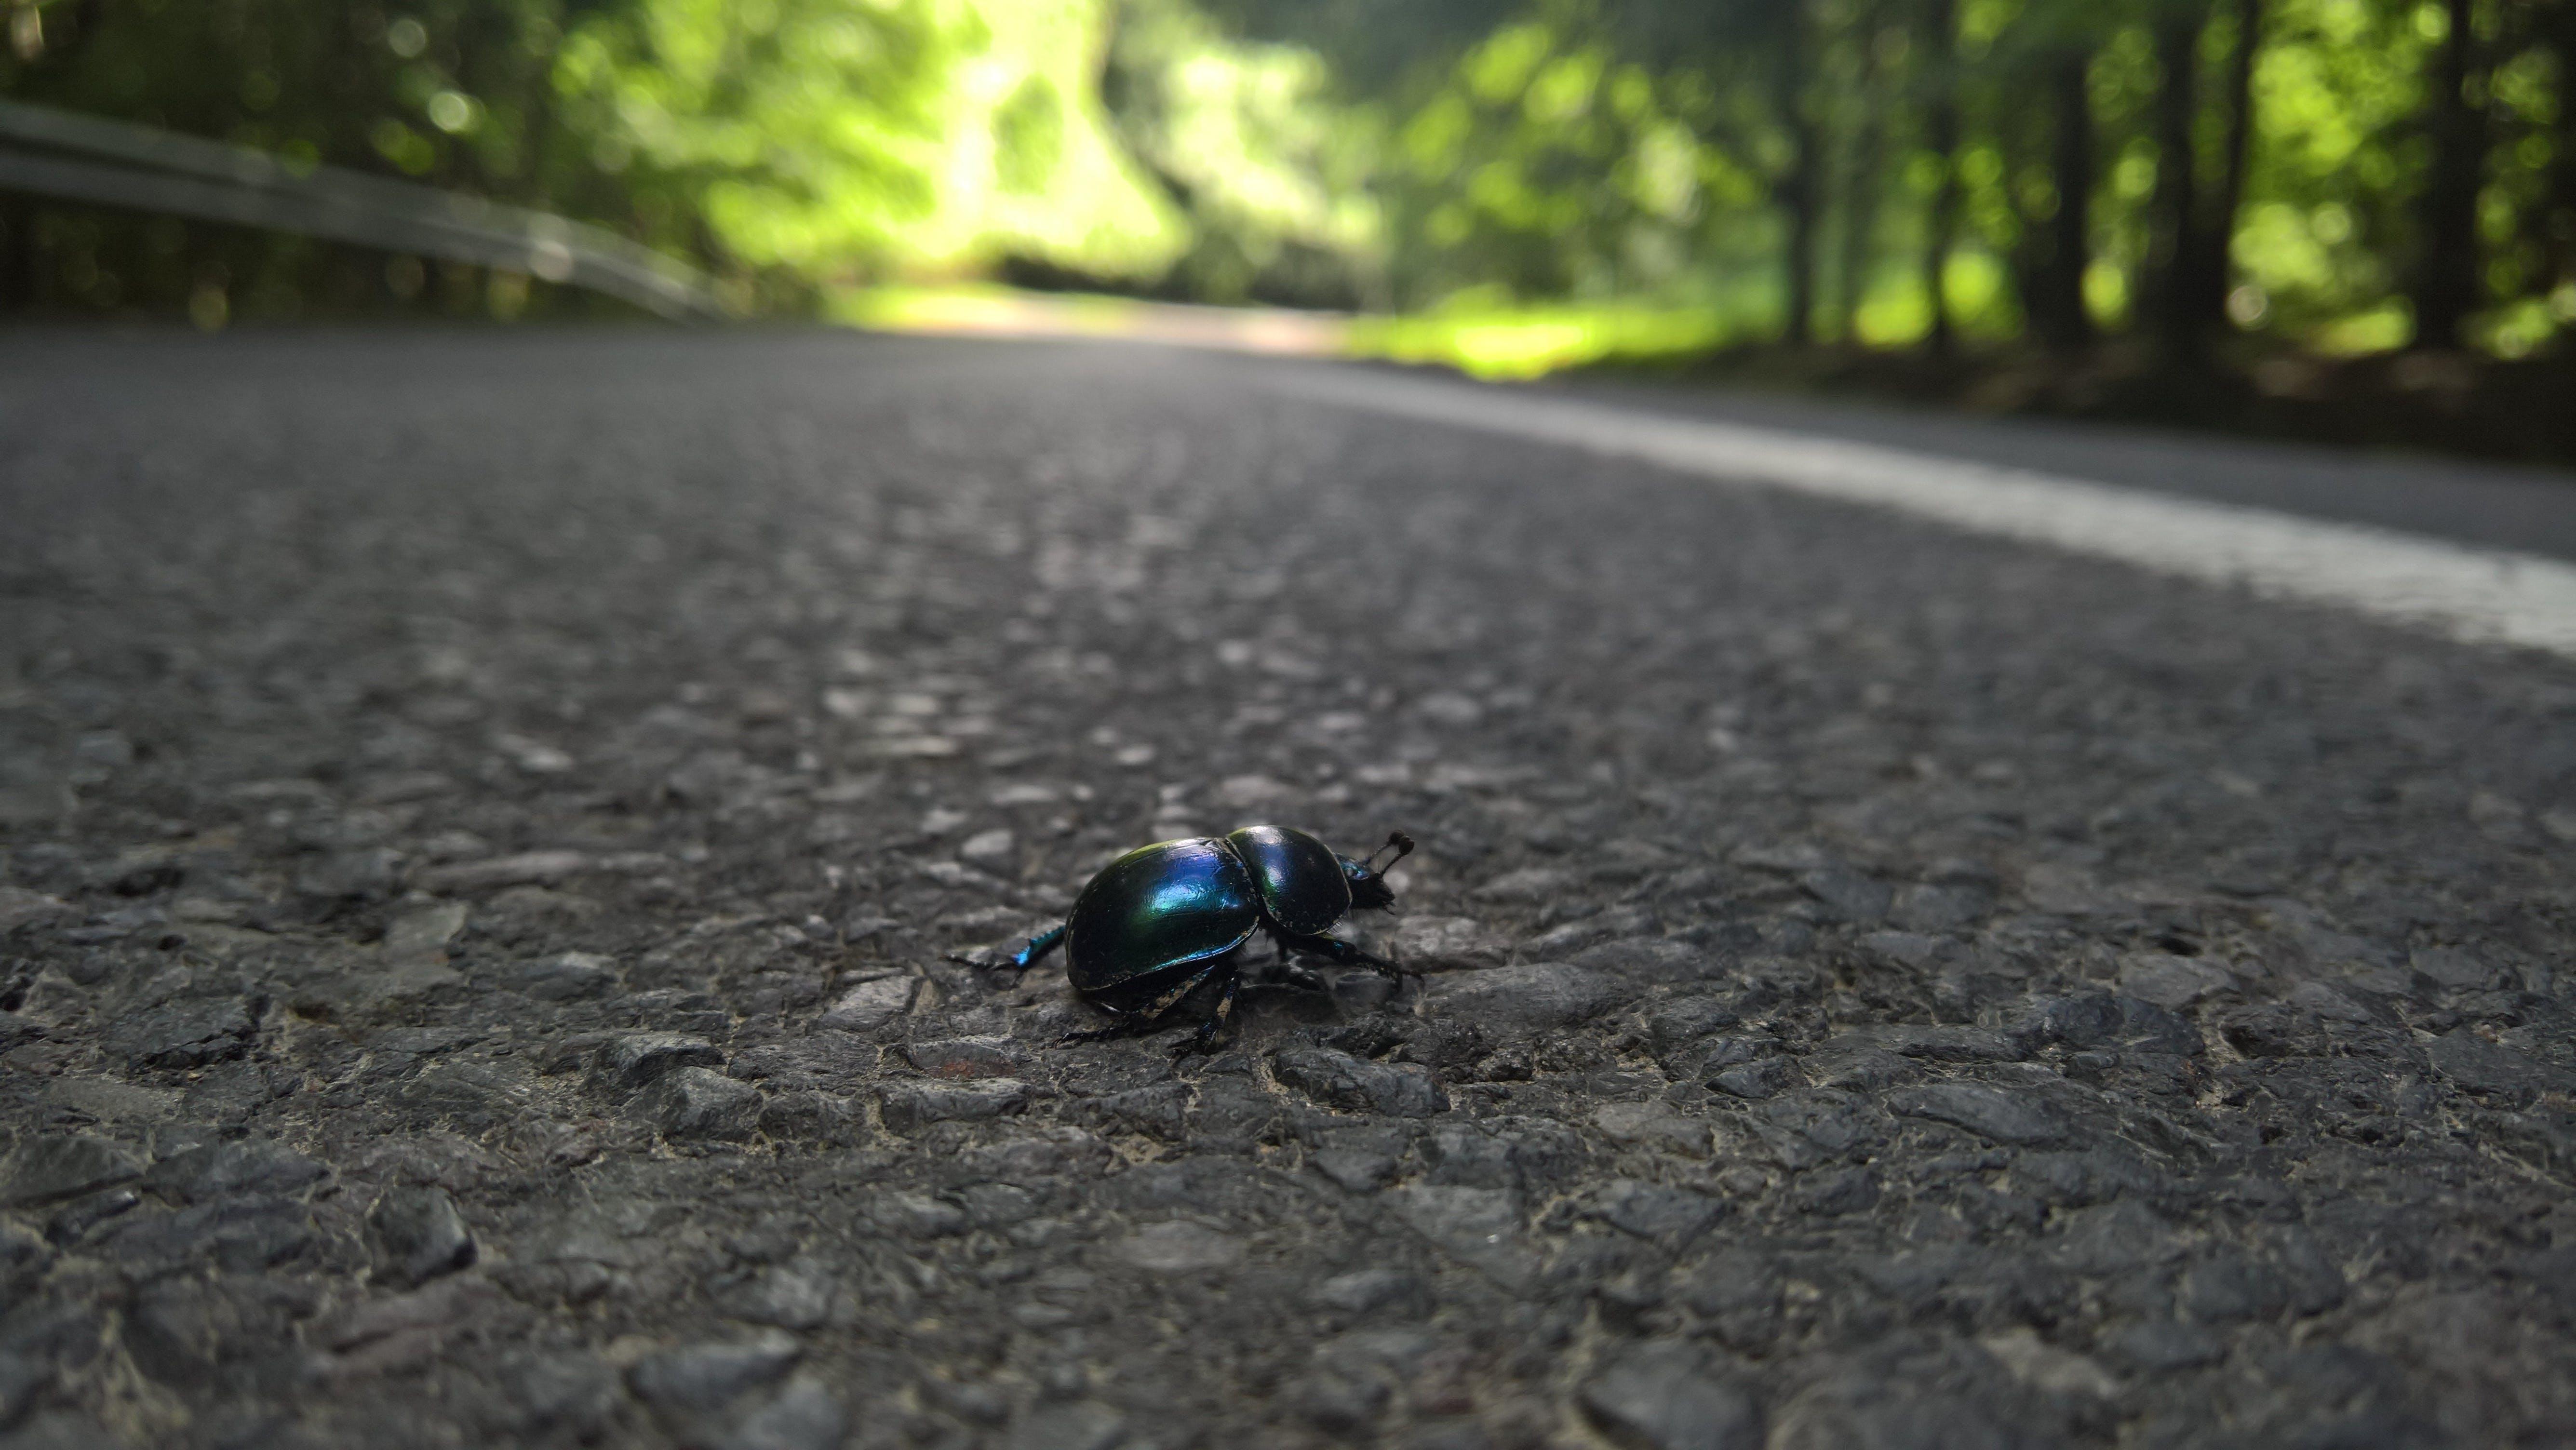 Kostenloses Stock Foto zu käfer